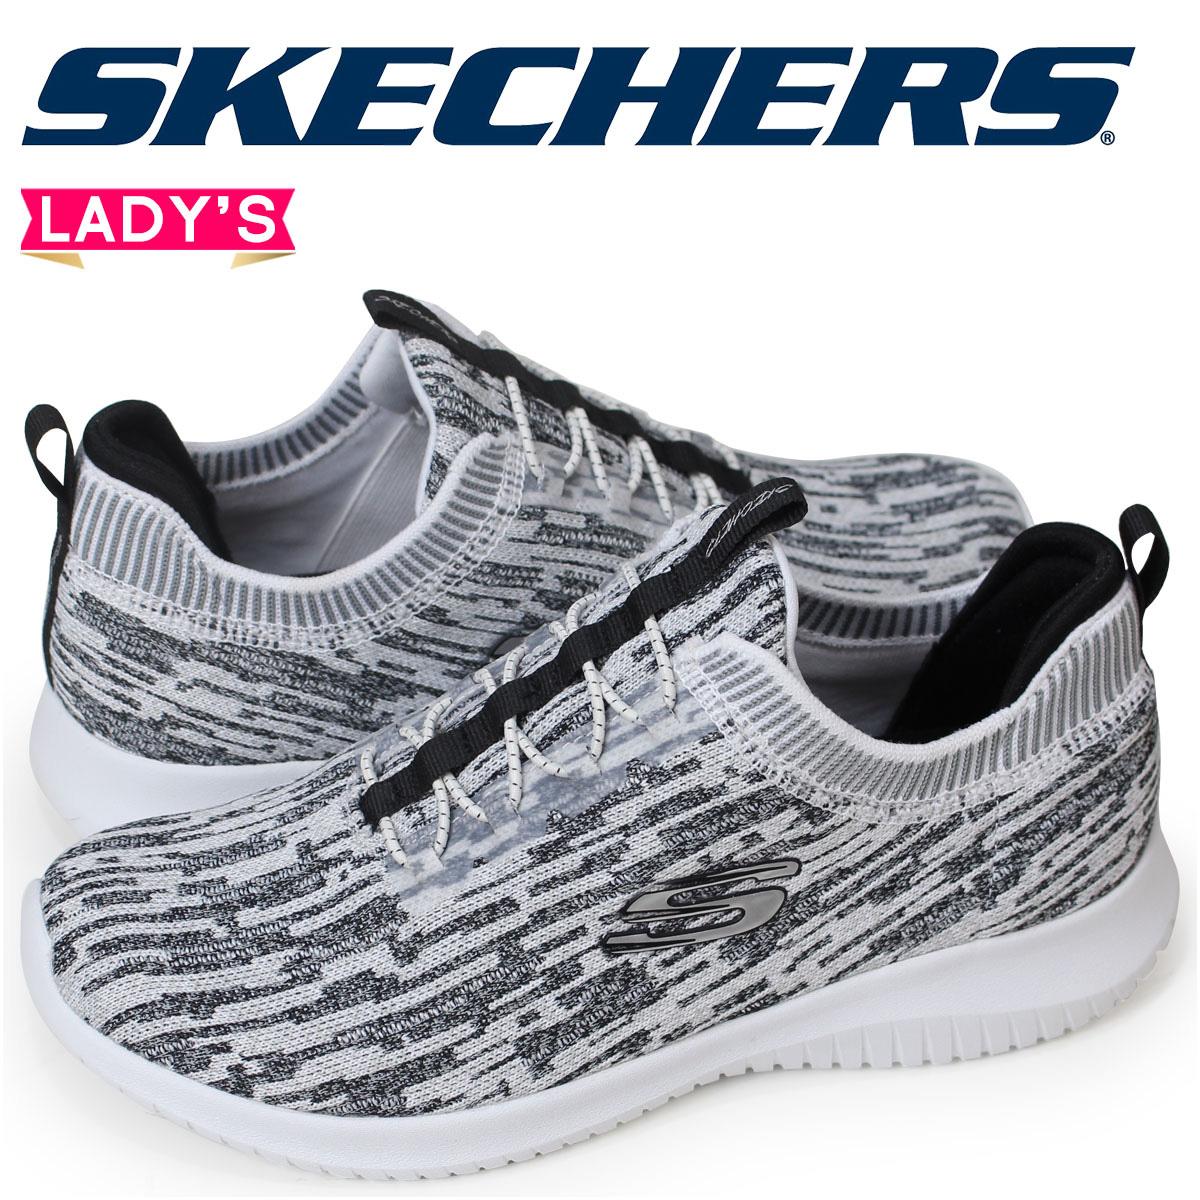 the new skechers